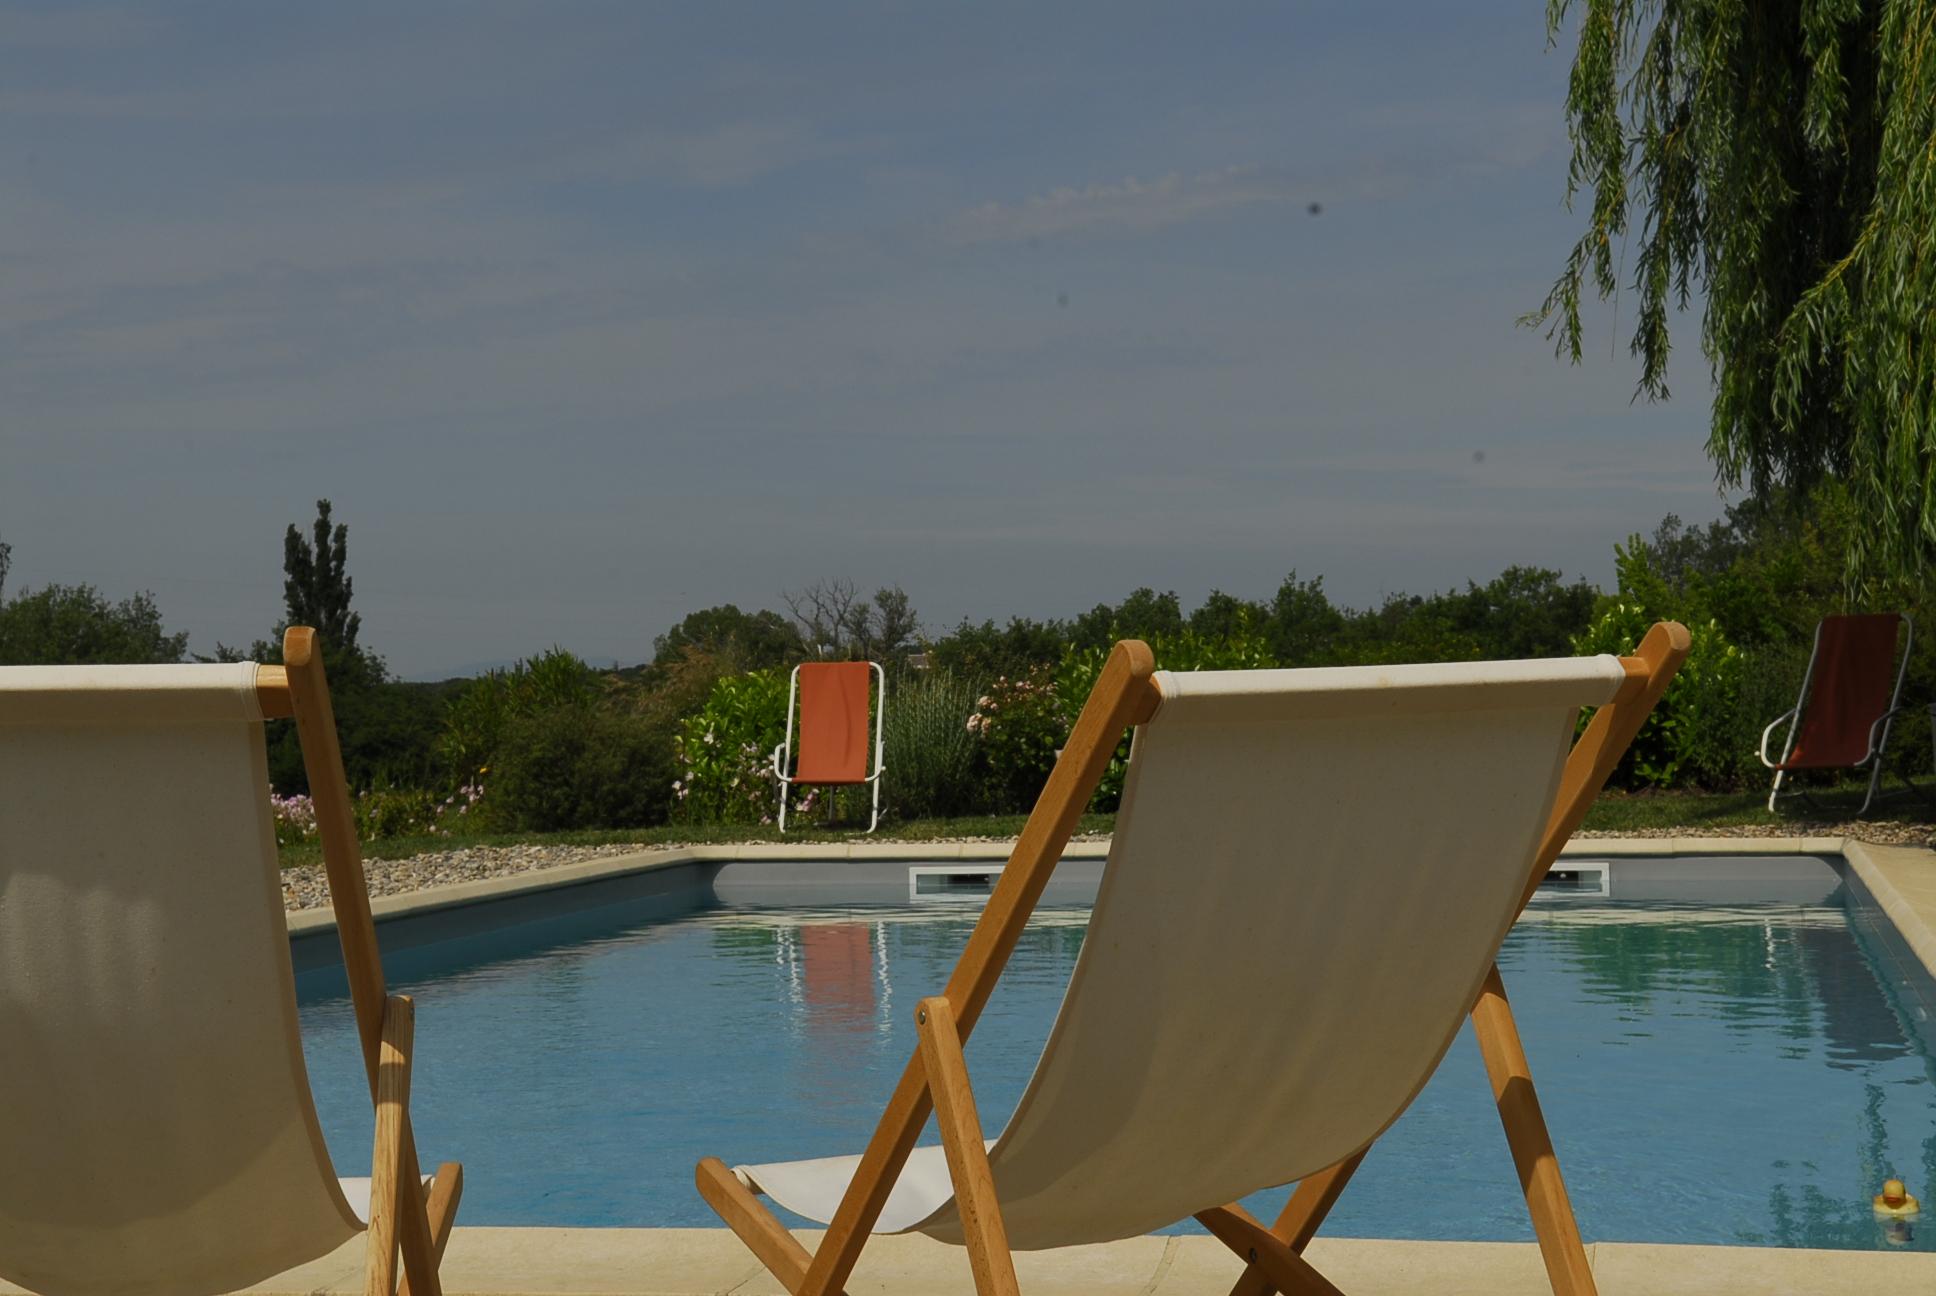 chambres d hotes grignan avec piscine drome provencale taulignan